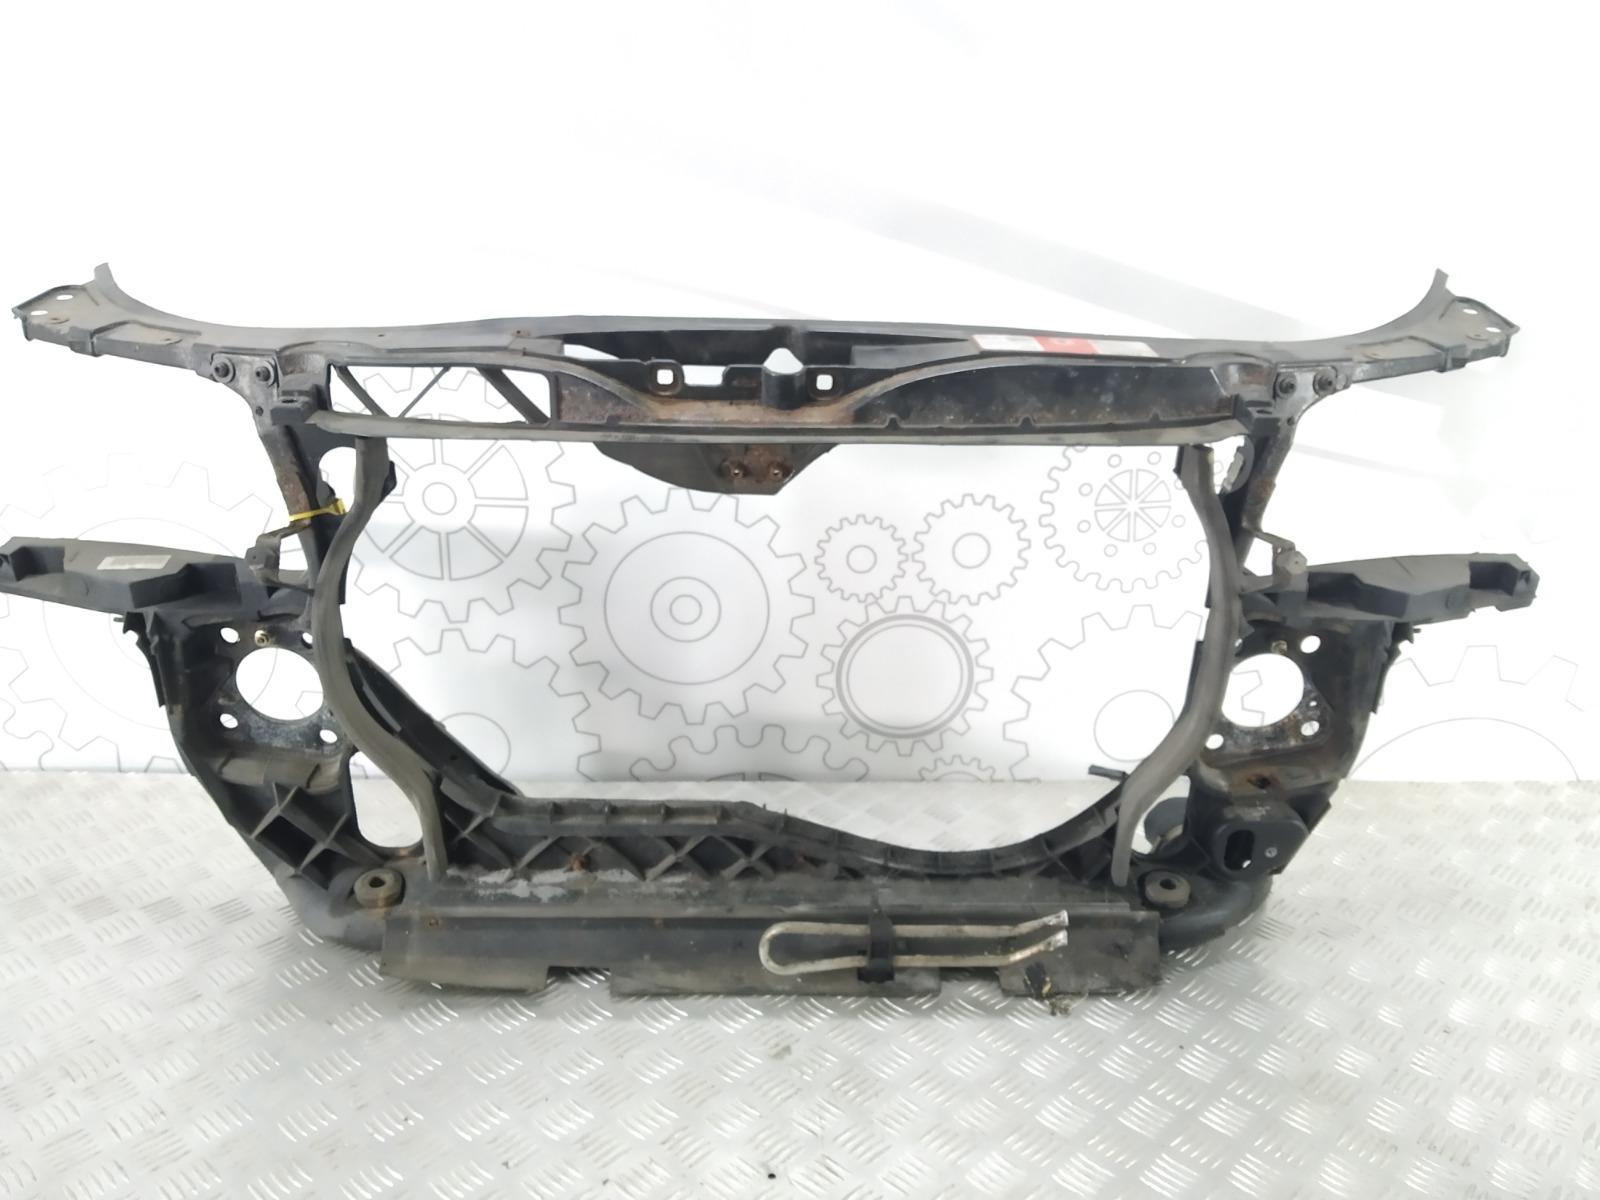 Передняя панель крепления облицовки (телевизор) Audi A4 B6 1.9 TDI 2004 (б/у)